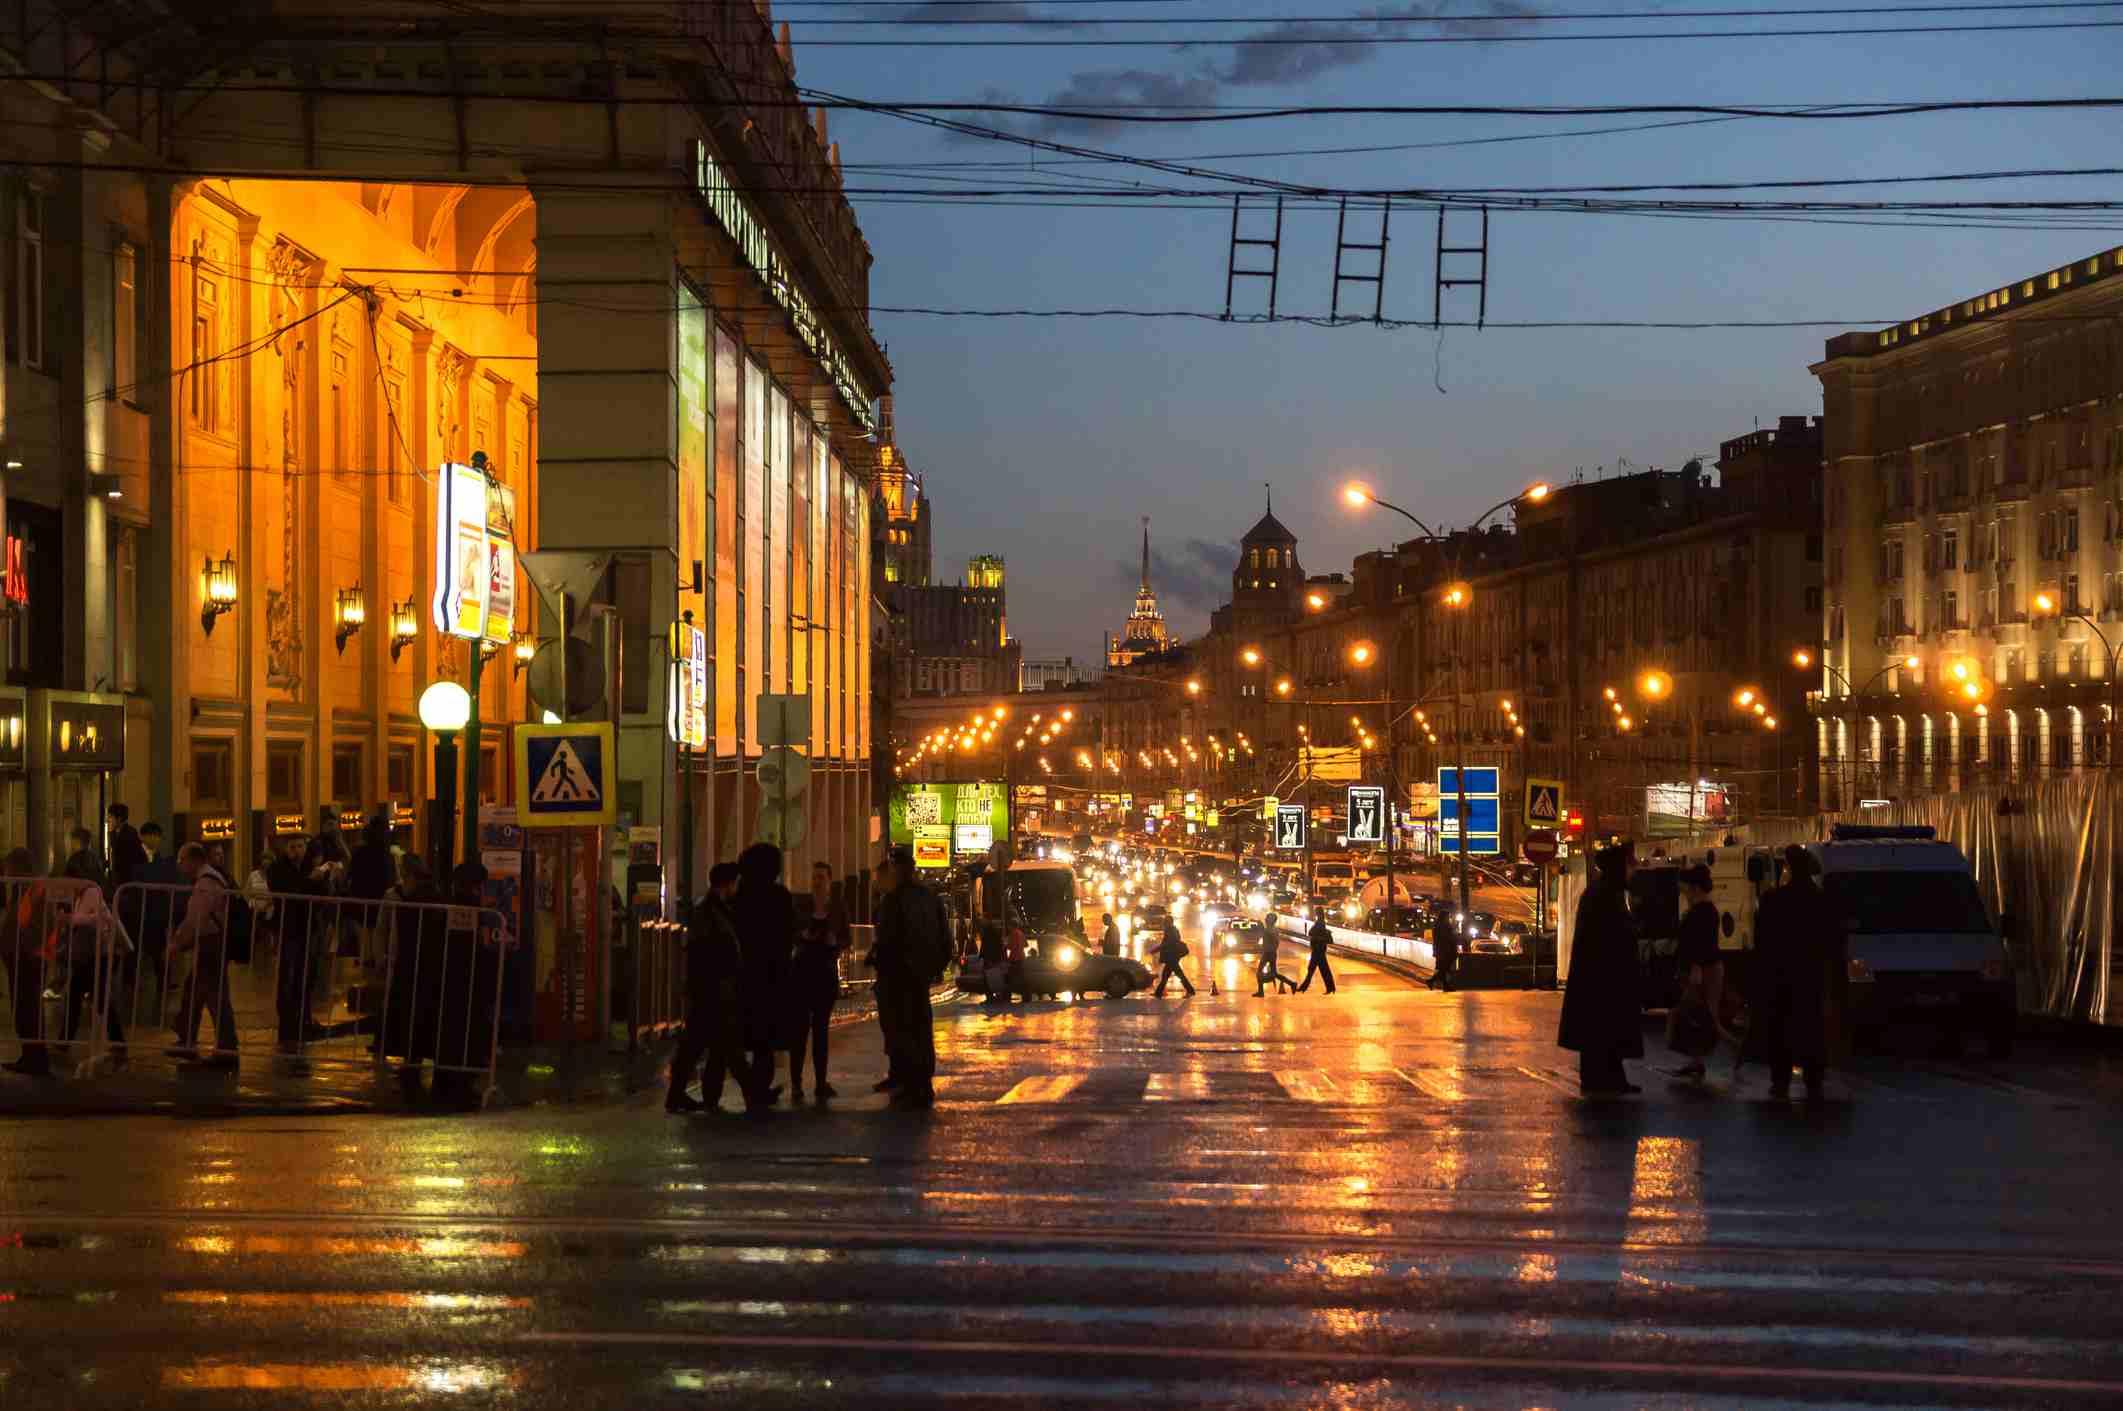 Triumfalnaya Square (former Mayakovsky Square) at night, central Moscow, Russia